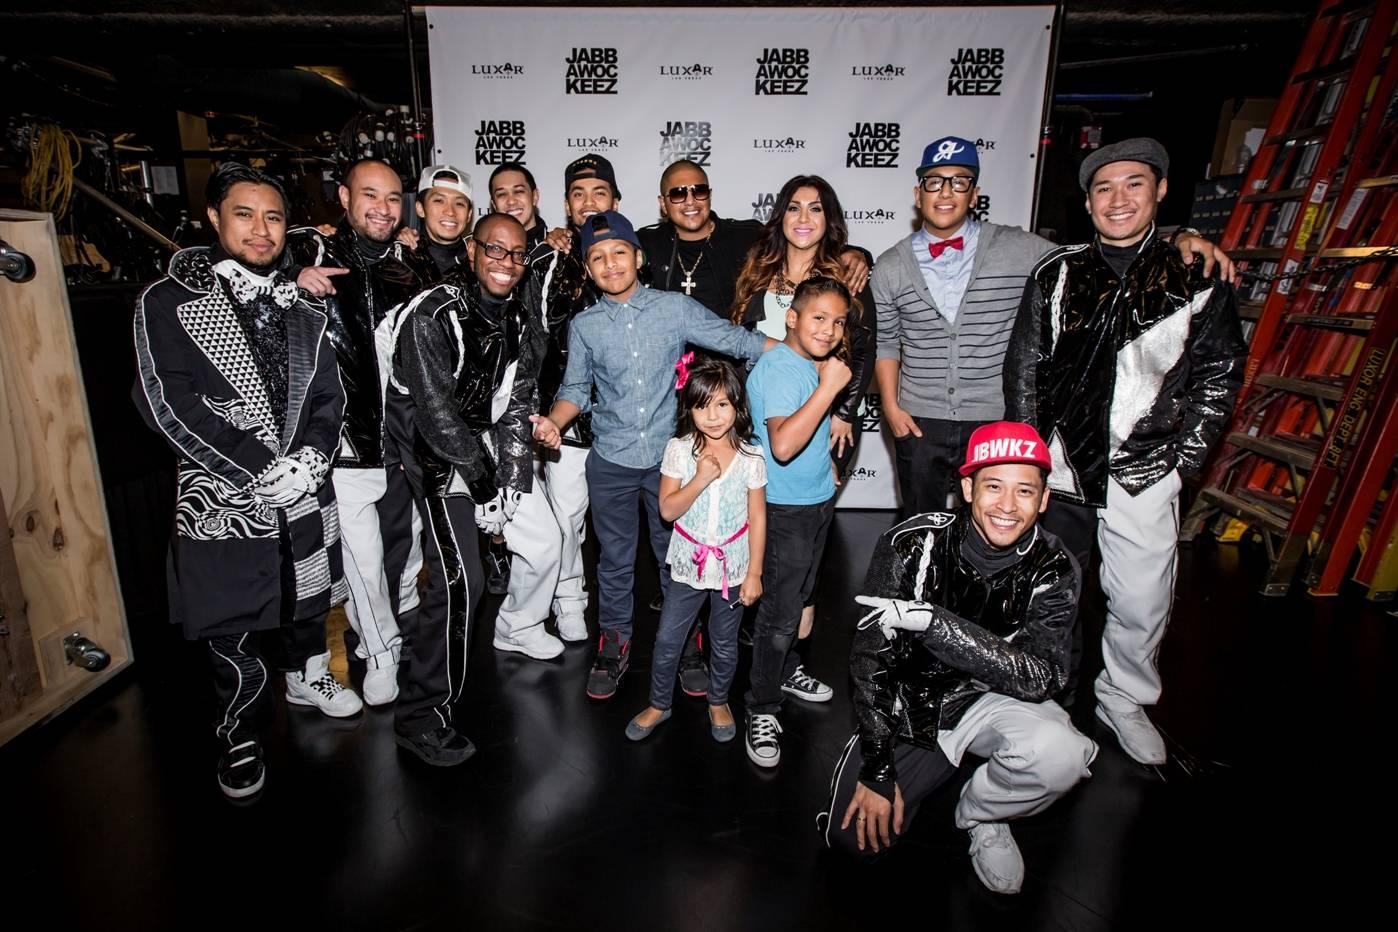 Fernando Vargas and his family at Jabbawockeez. Photo: Joshua Jose